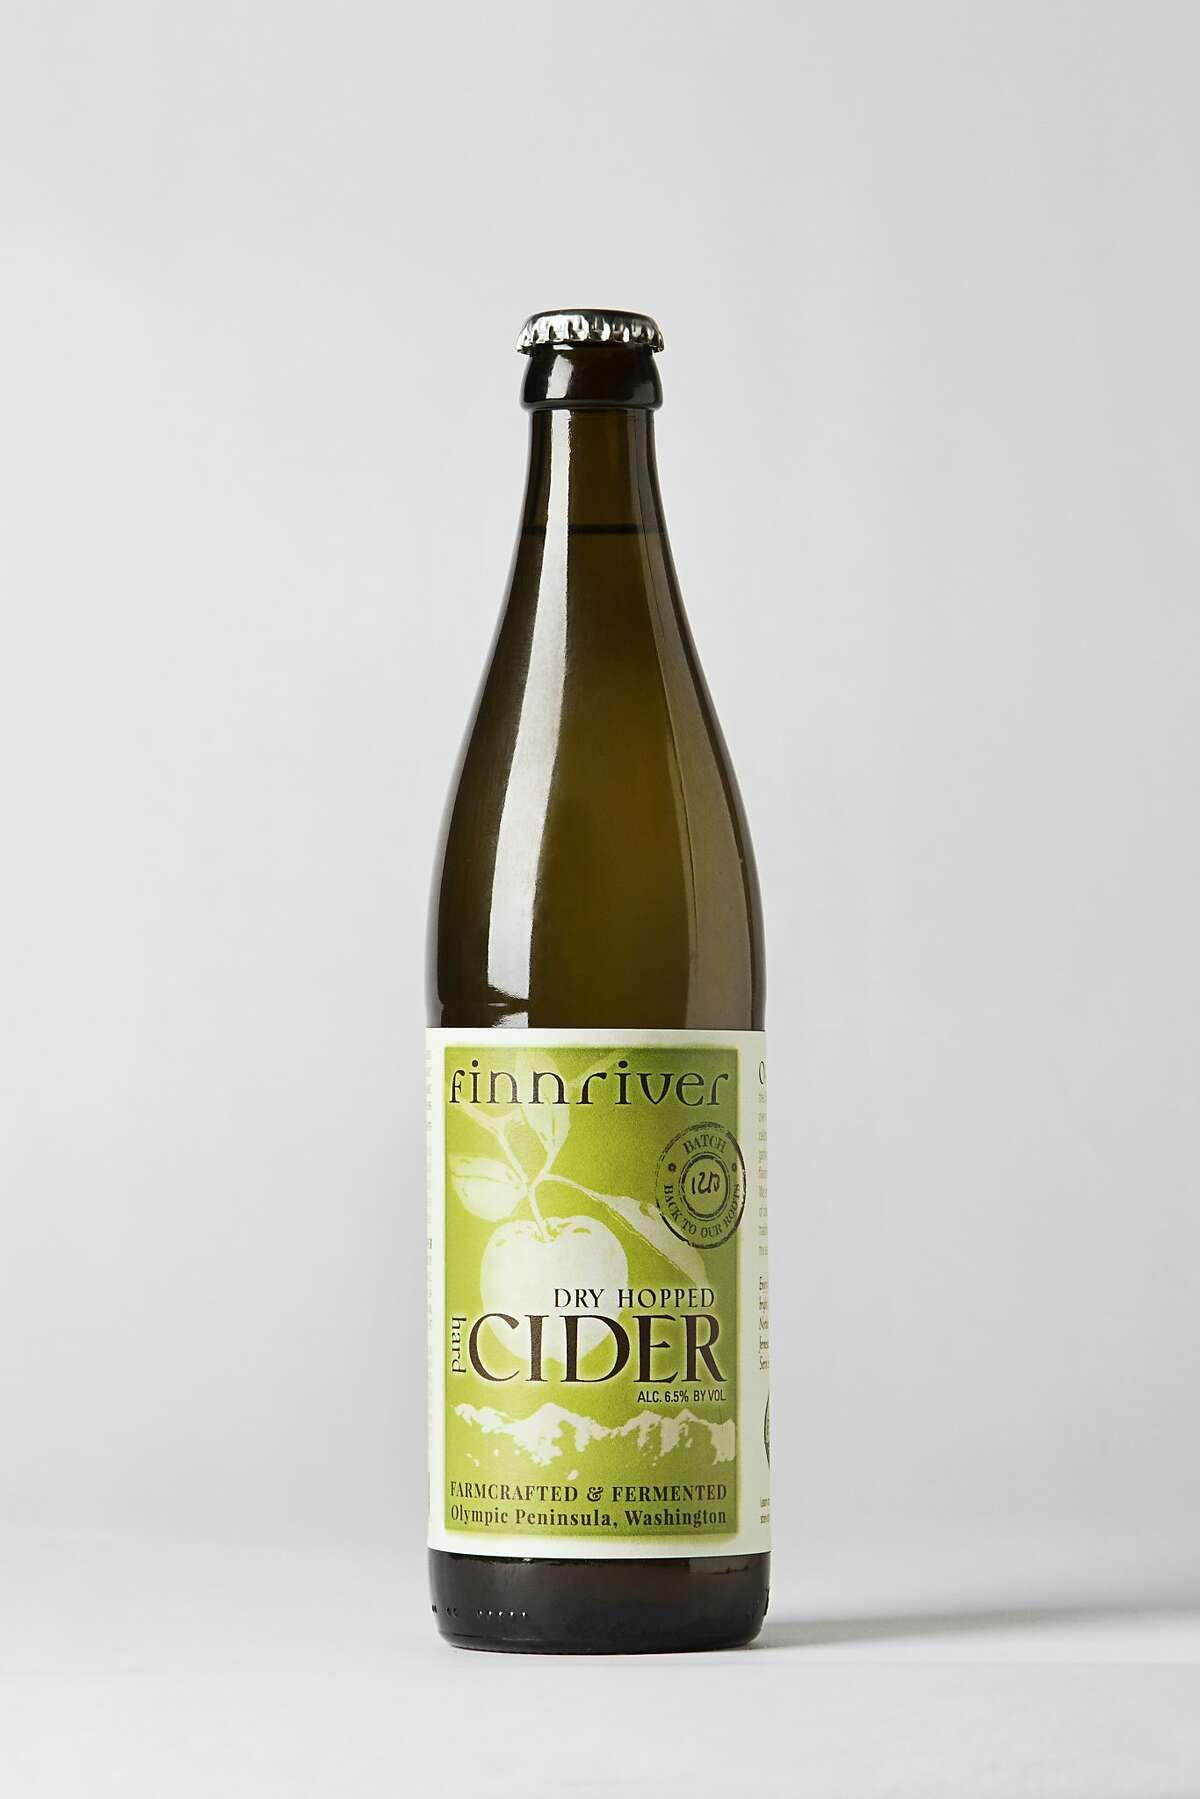 Finnriver Cider Finnriver Dry Hopped Cider was shot in studio on April 9th, 2014 in San Francisco, Calif.